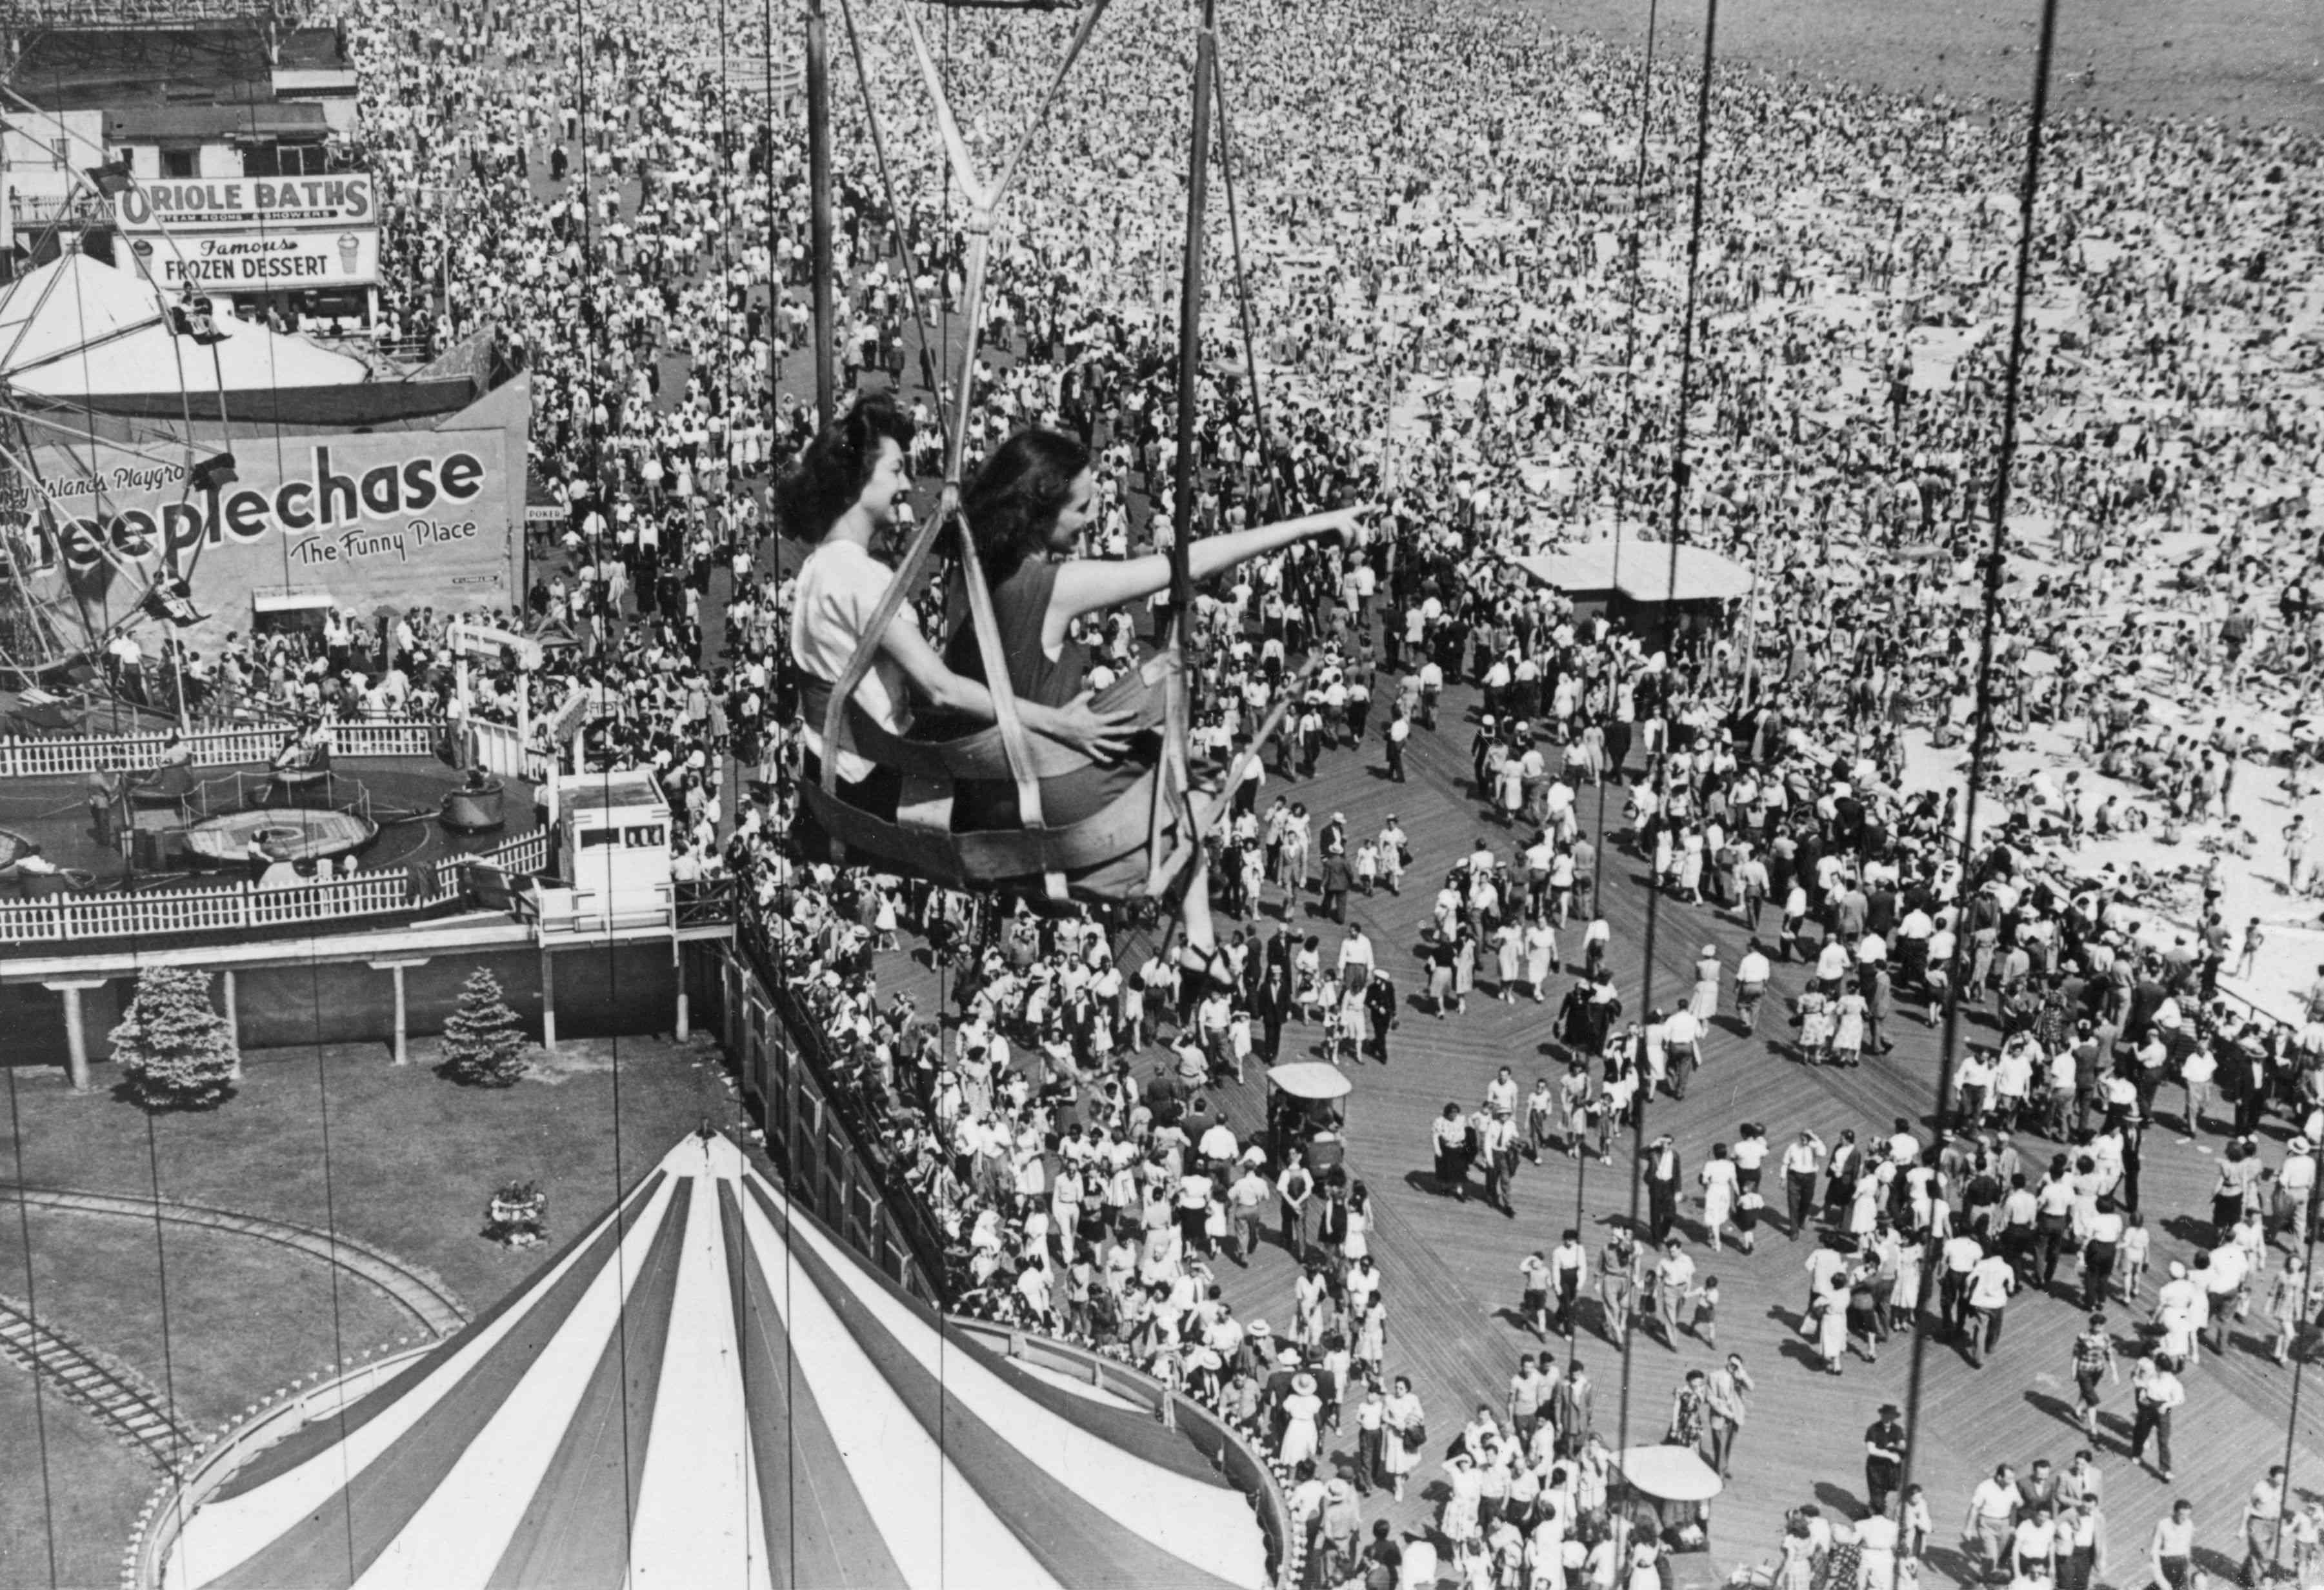 Crowds at Coney Island